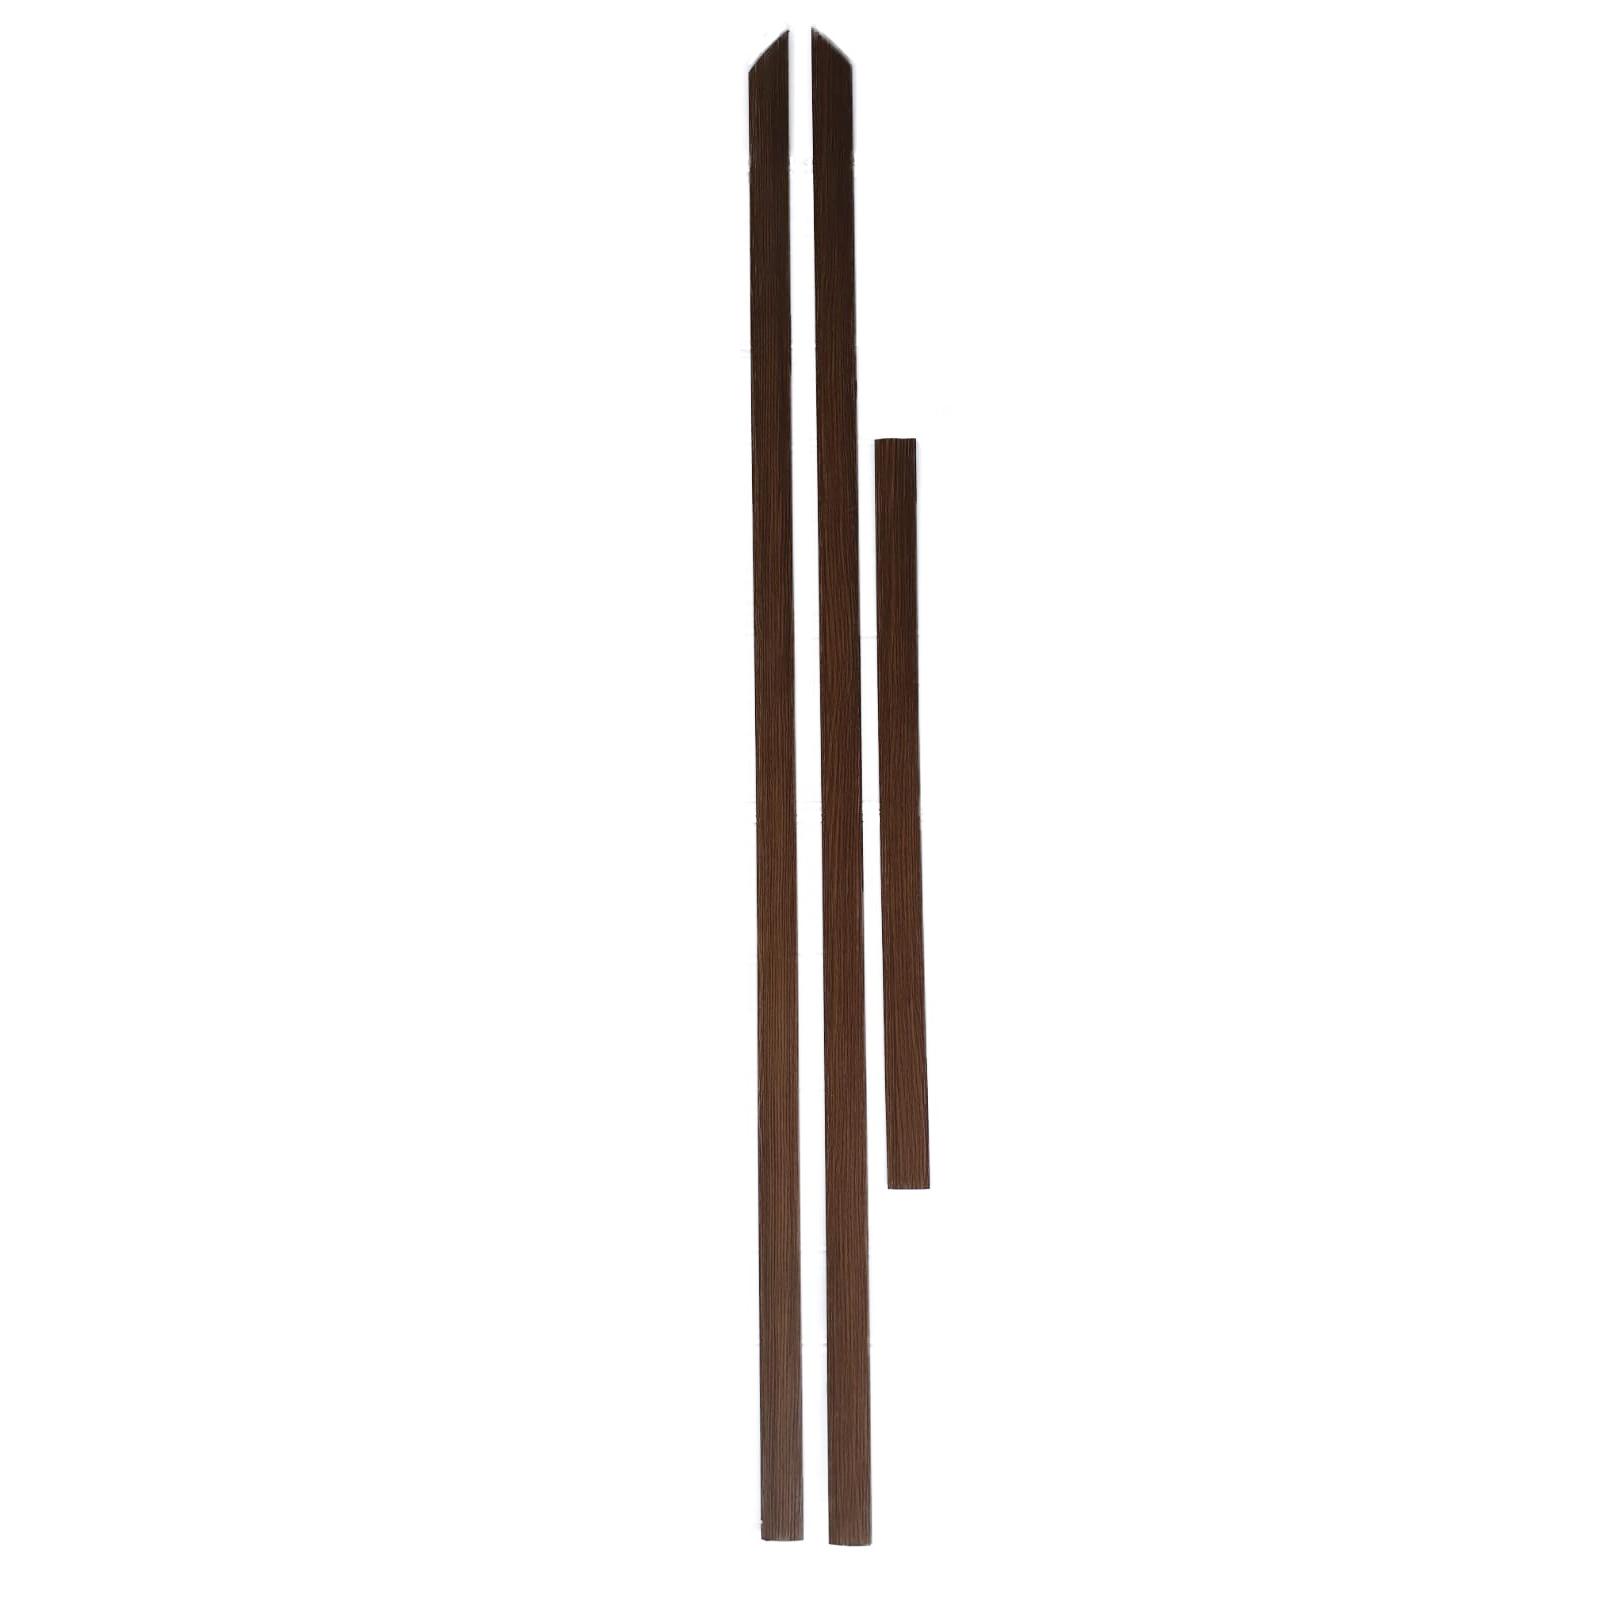 Pervaz usa interior Pamate stejar auriu, 6 x 0,5 cm imagine 2021 mathaus